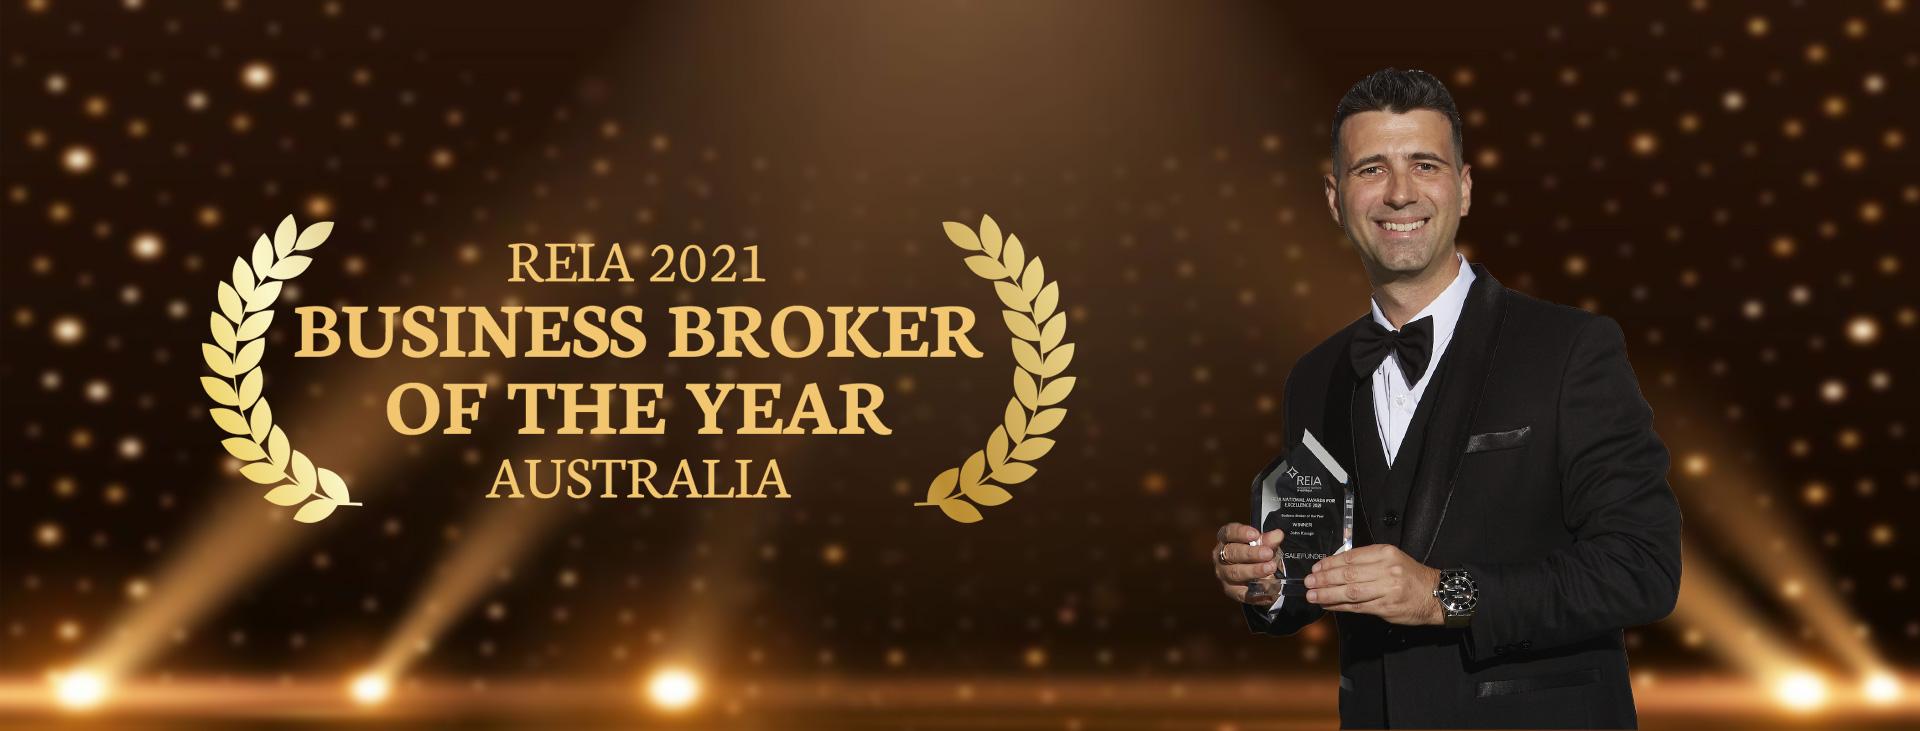 John Kasapi Award Winning Salon Business Broker REIA